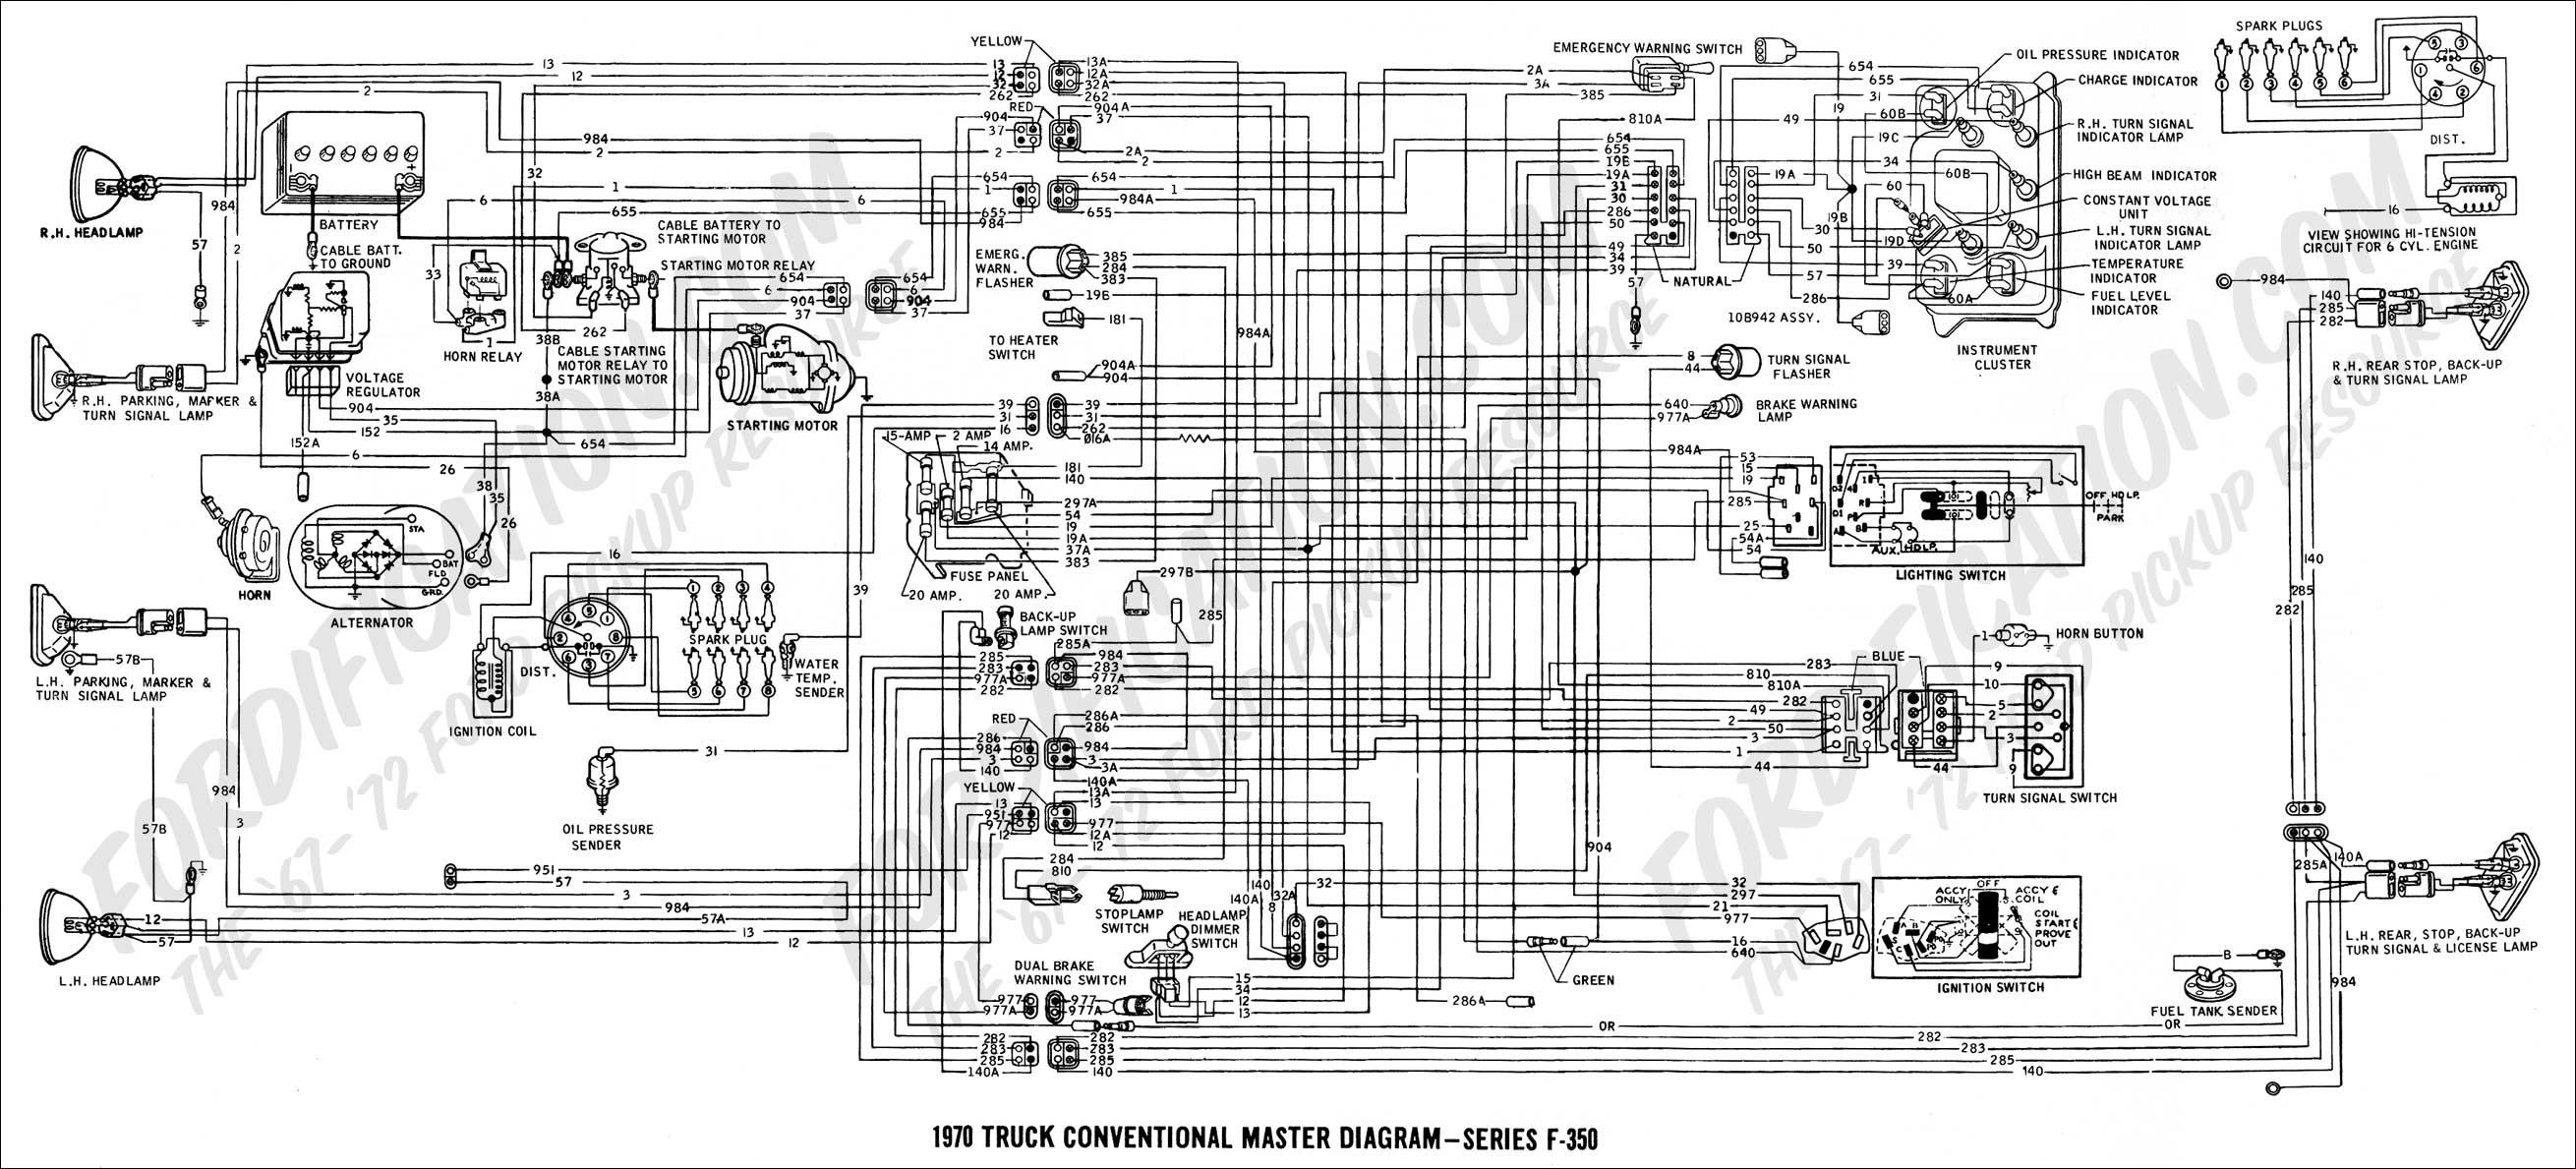 ford f350 wiring diagram about wiring u2022 gatbook co rh gatbook co 2005 f250 mirror wiring diagram 2005 f250 mirror wiring diagram